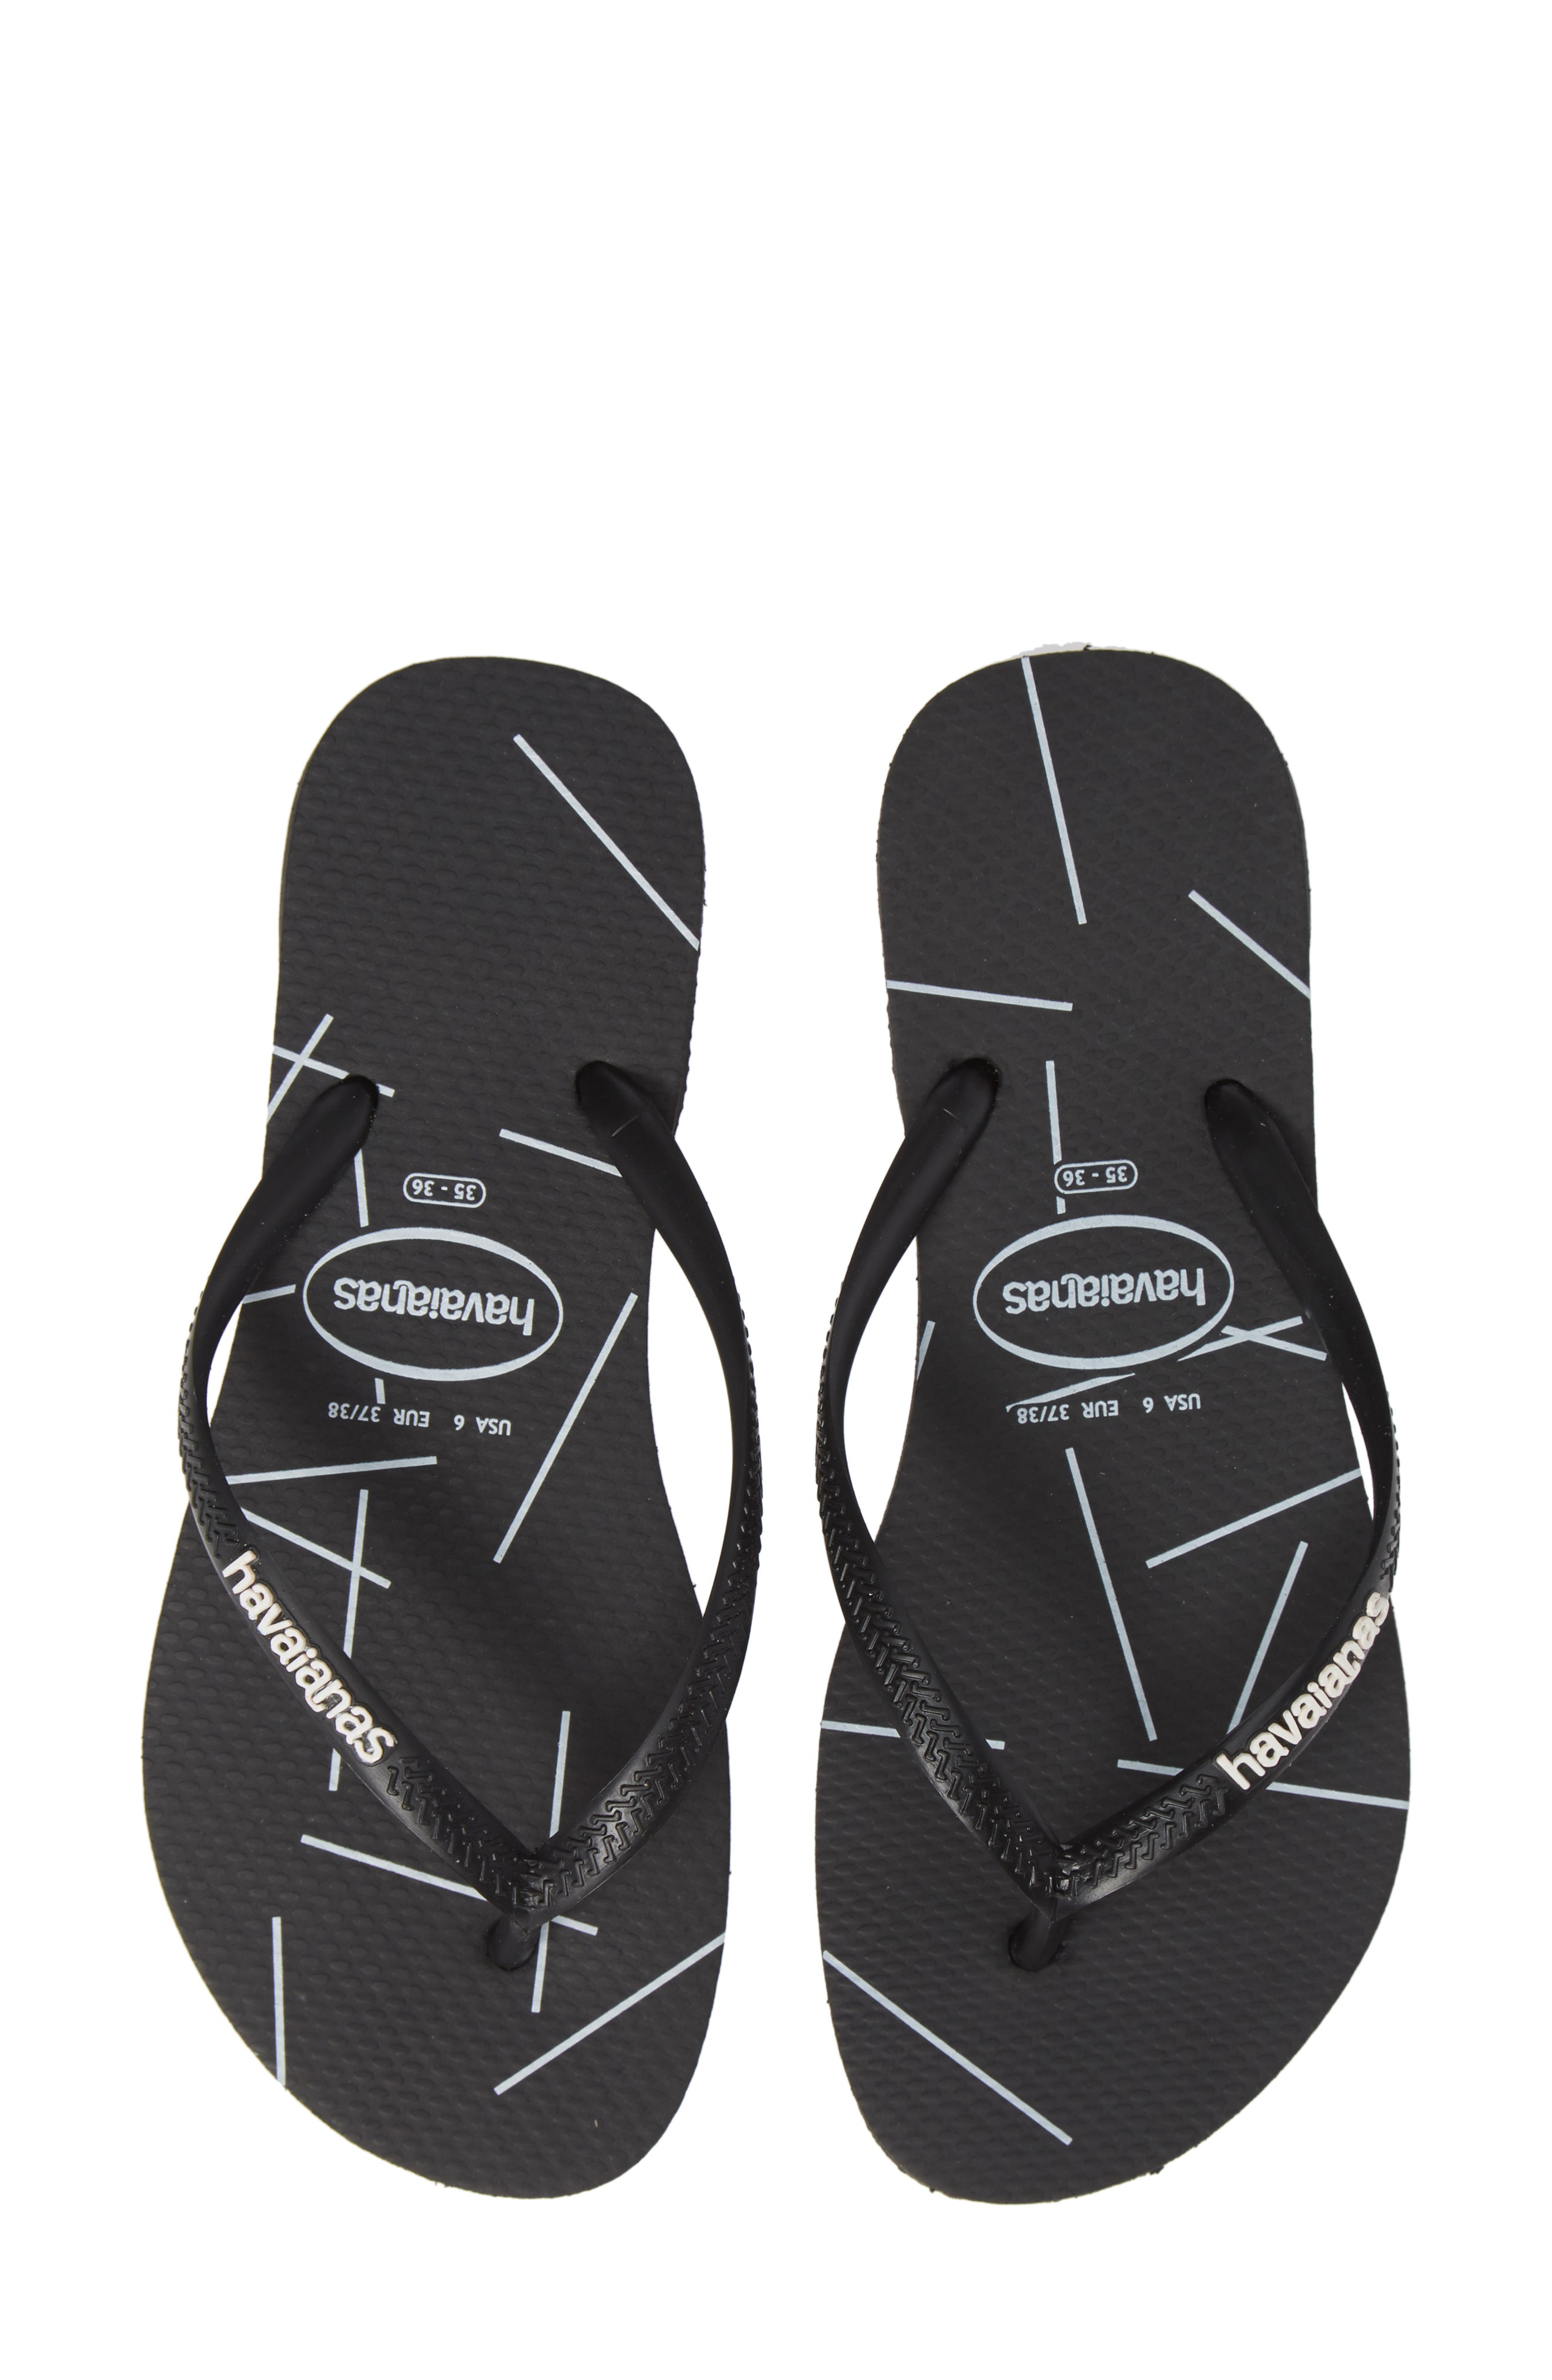 01a4edb5d555 Havaianas Slimstripes Flip Flop In Color Block White